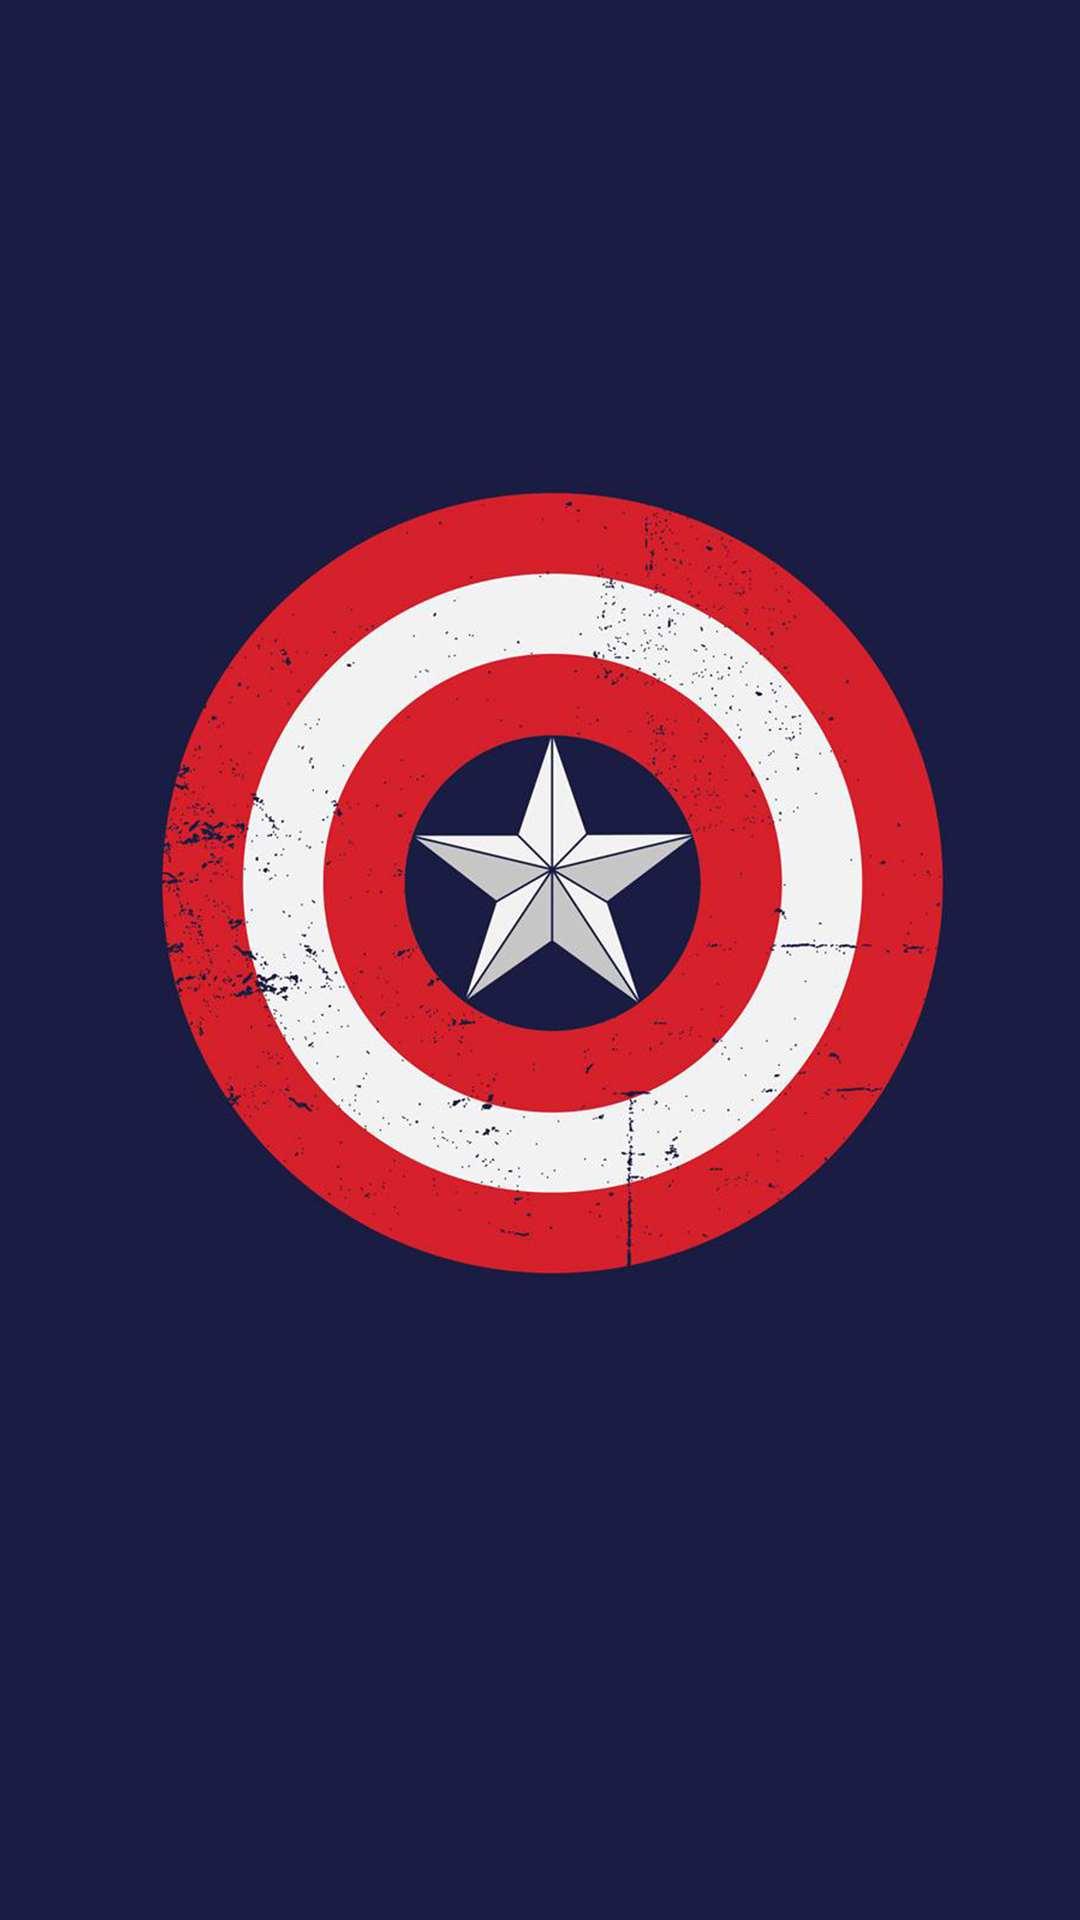 Cute Wallpapers Download For Desktop Captain America Shield Minimal Iphone Wallpaper Iphone